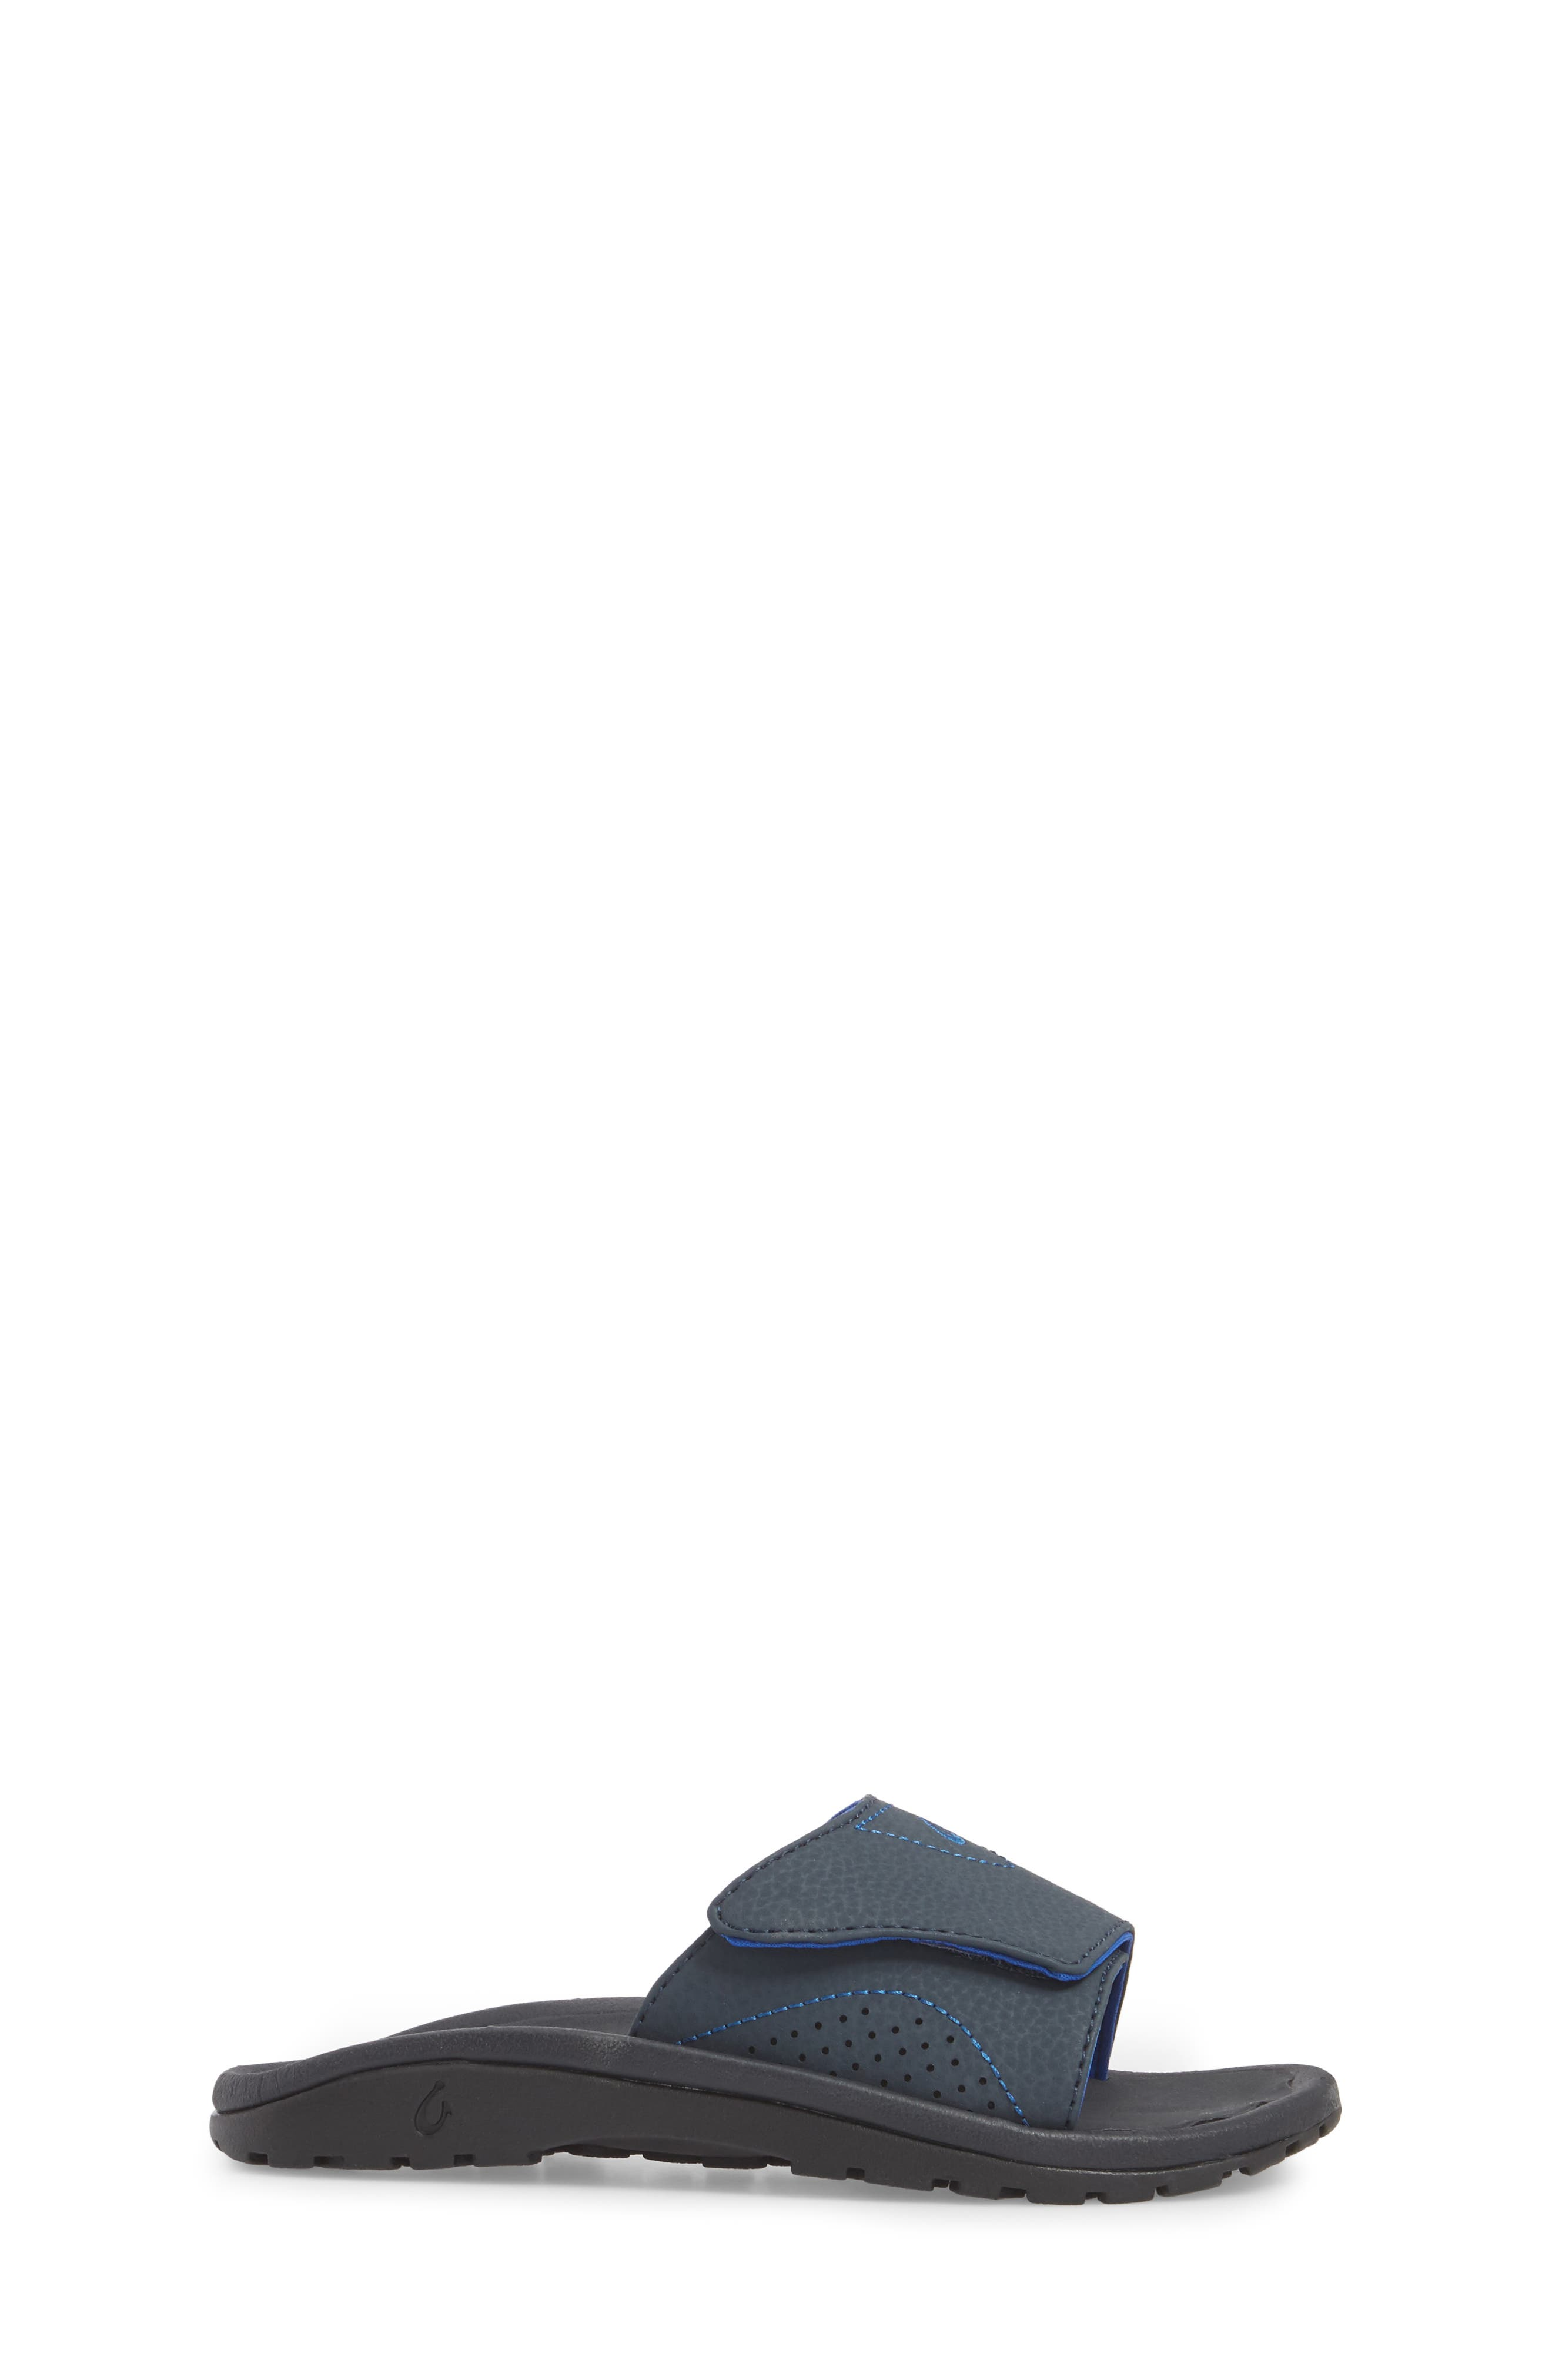 Alternate Image 3  - OluKai Nalu Slide Sandal (Toddler, Little Kid & Big Kid)